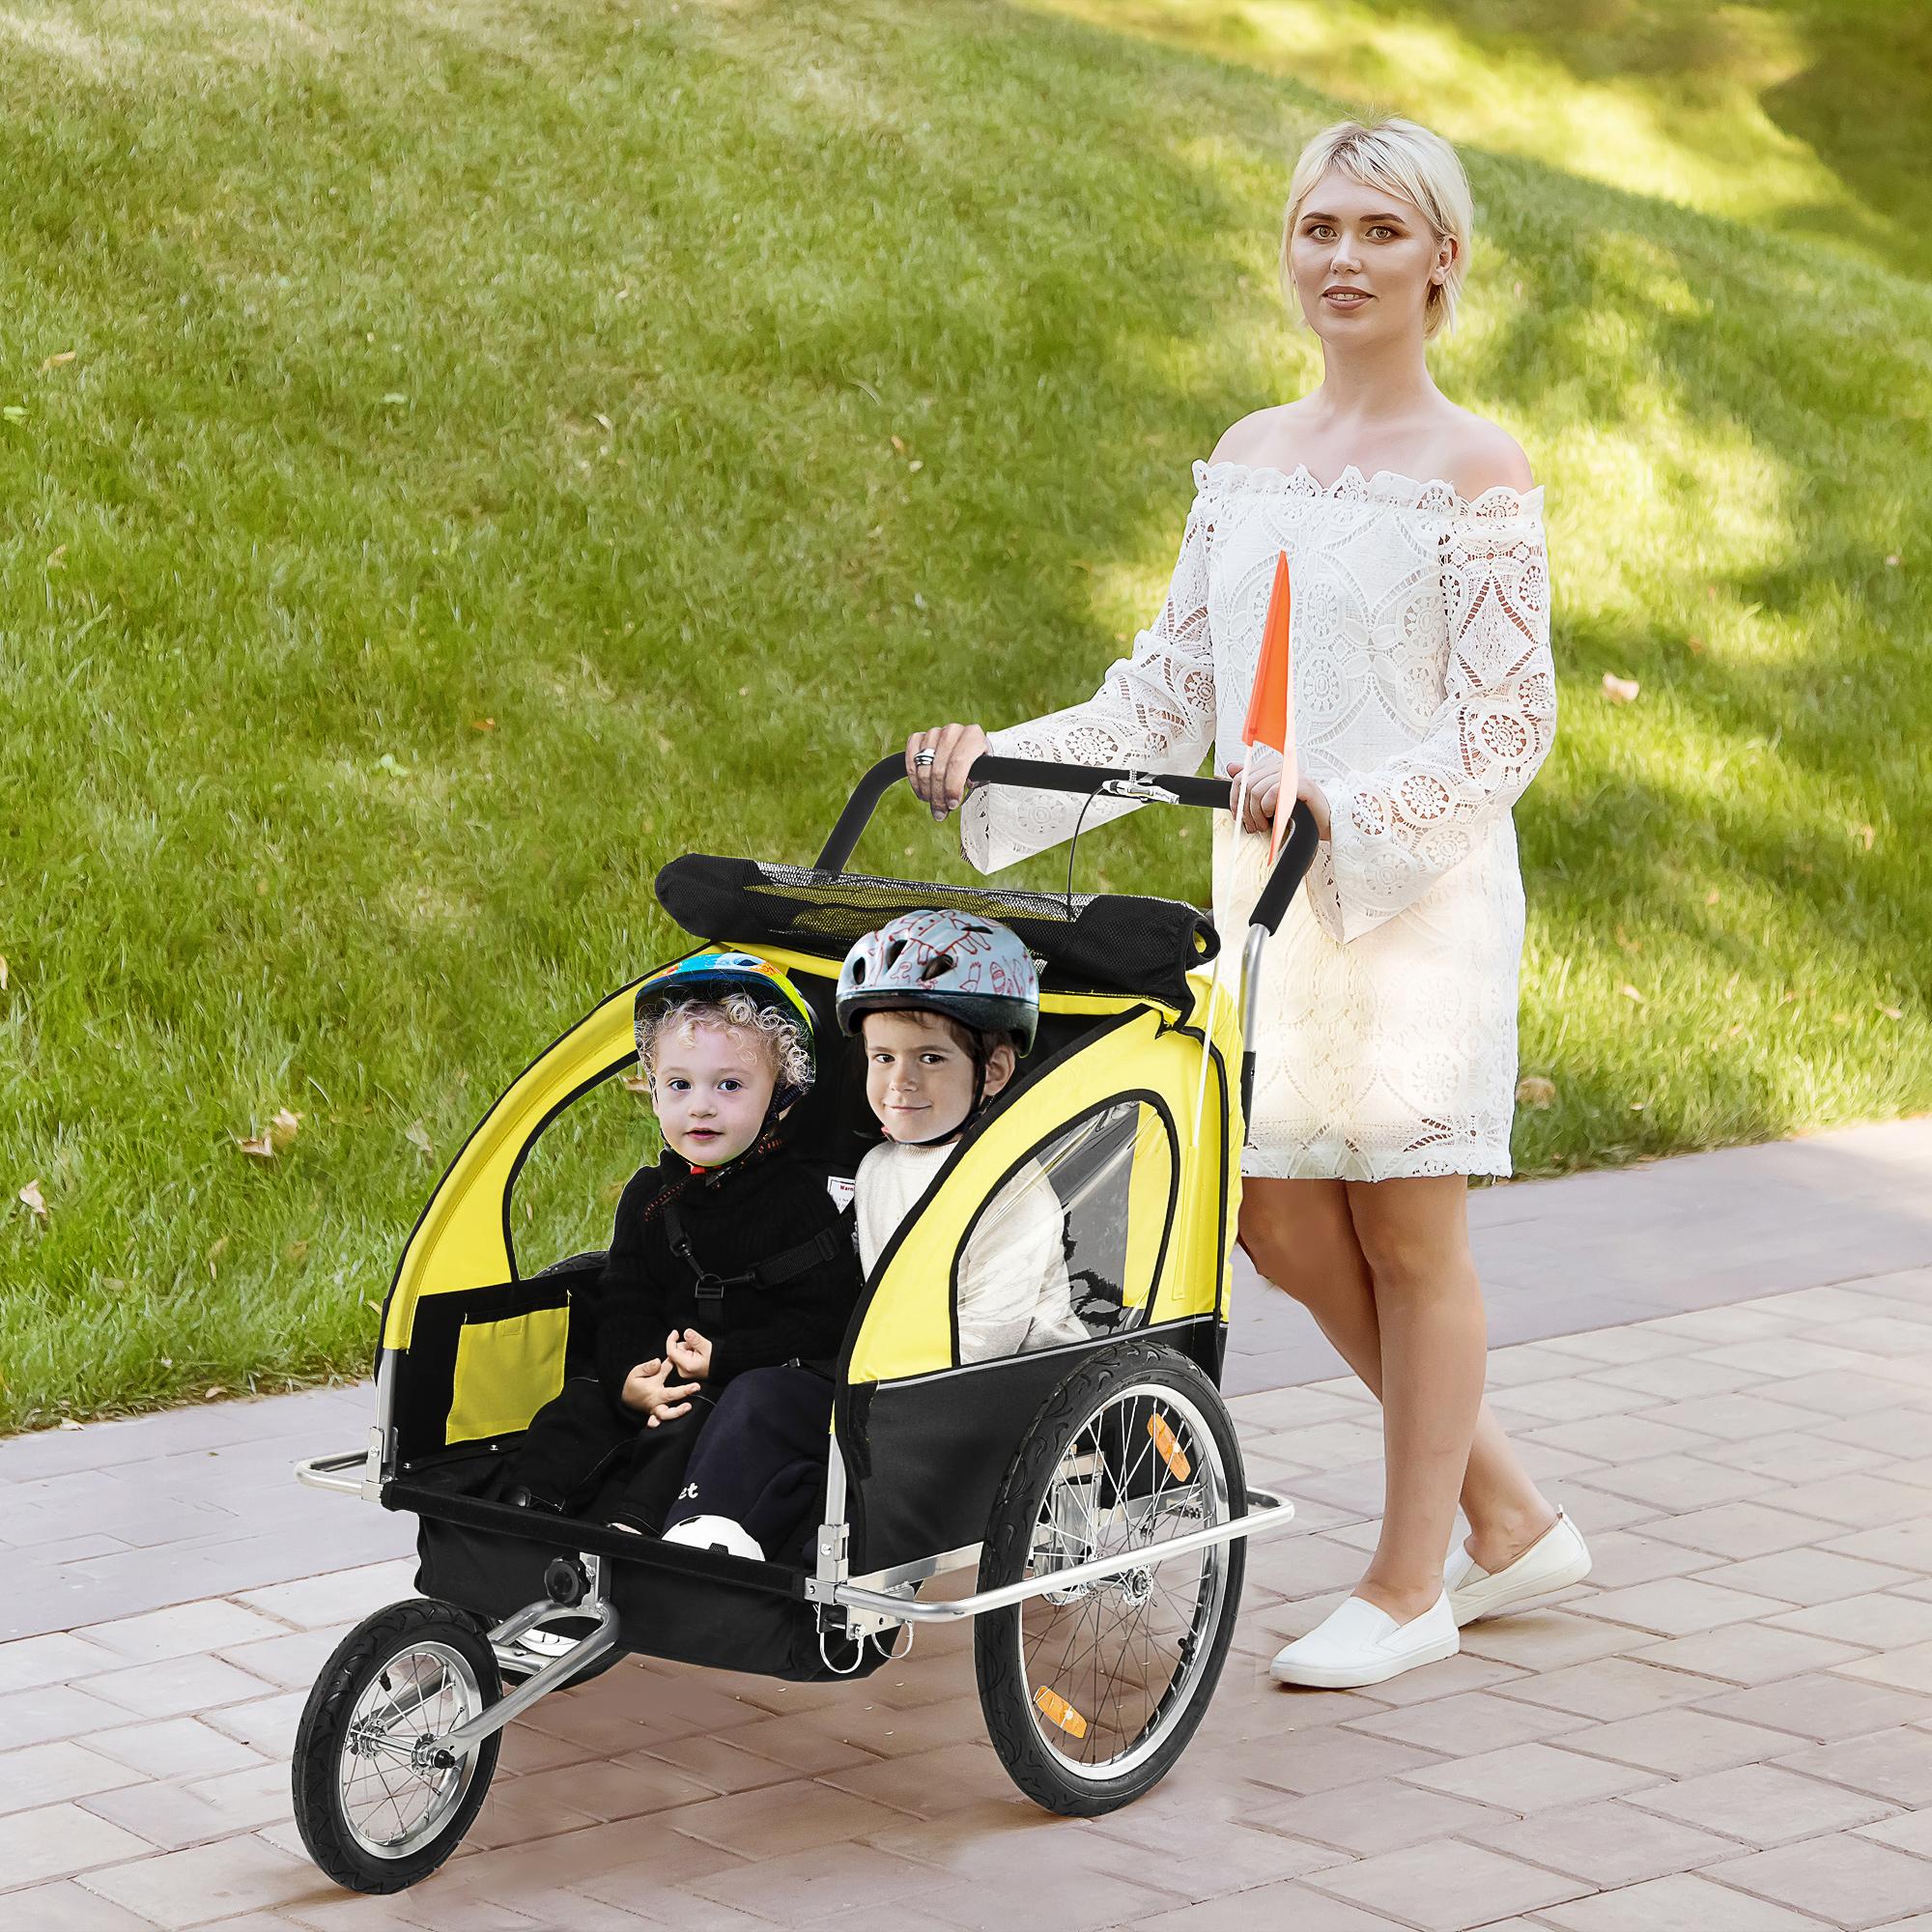 miniatura 10 - Remolque Bicicleta Niño 2 PLAZAS+Amortiguador Kit Footing Freno Bandera Cubierta